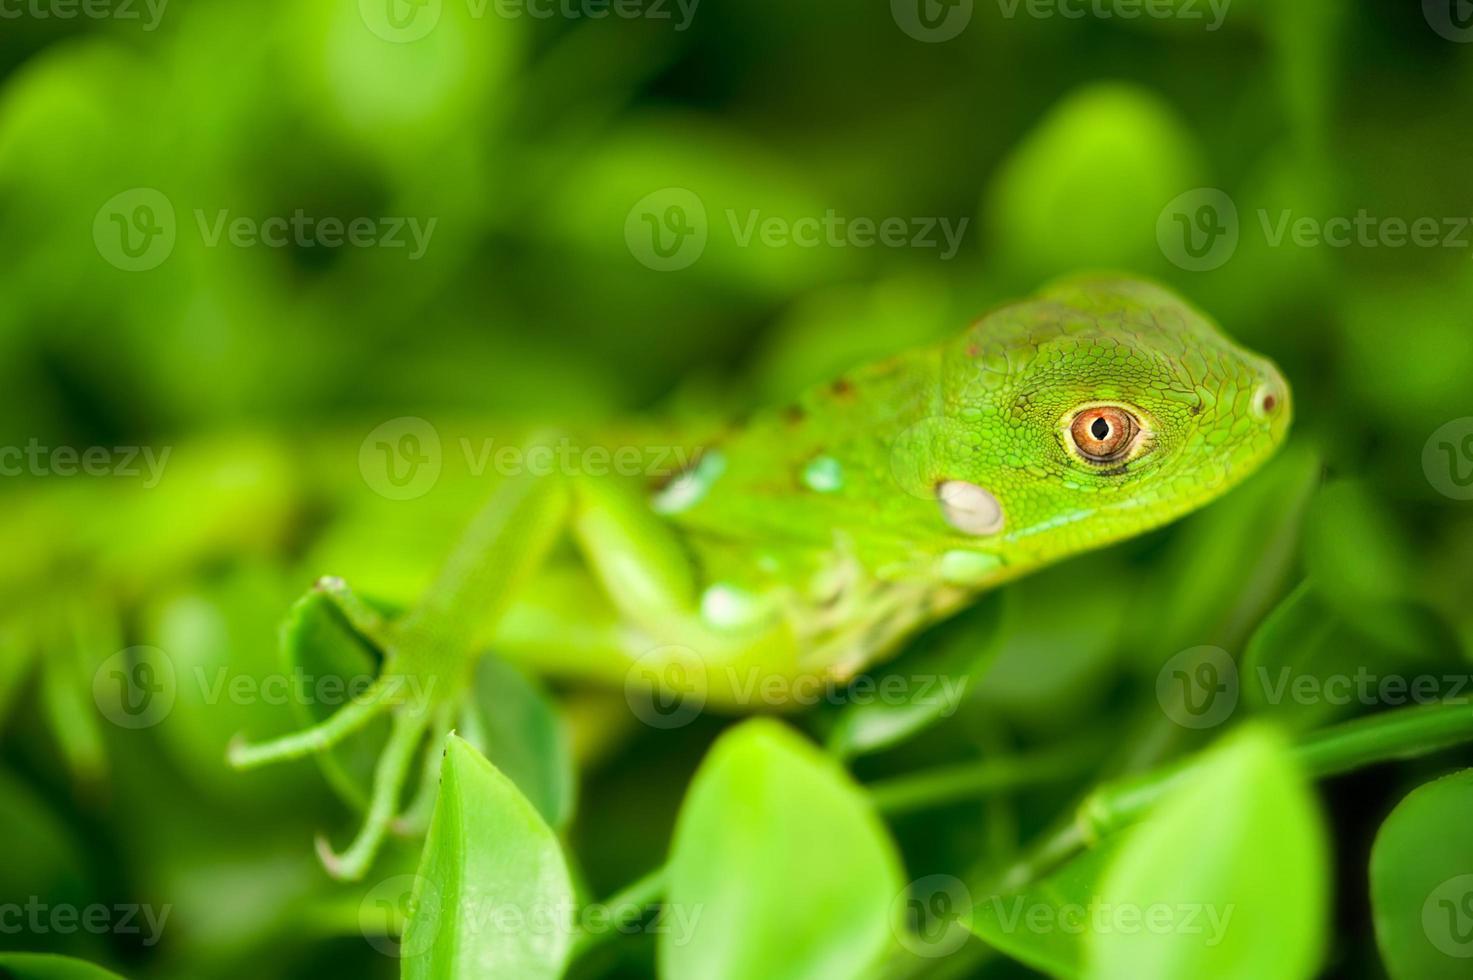 tiro en la cabeza de una iguana verde bebé foto